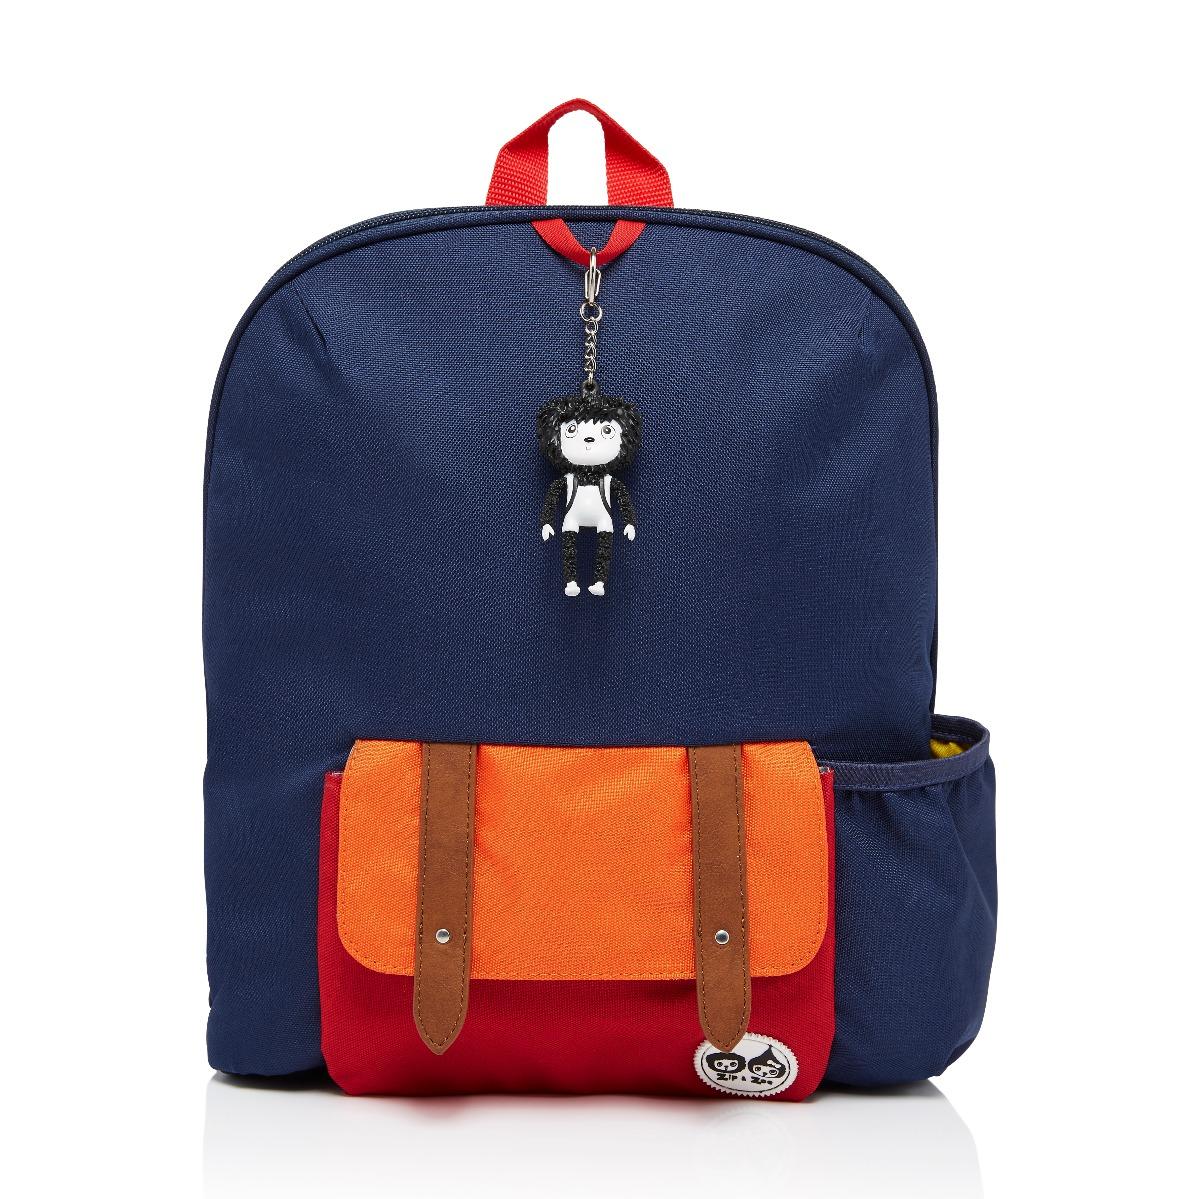 Zip and Zoe Midi Kid's Backpack (3-7Y) Navy Colour Block